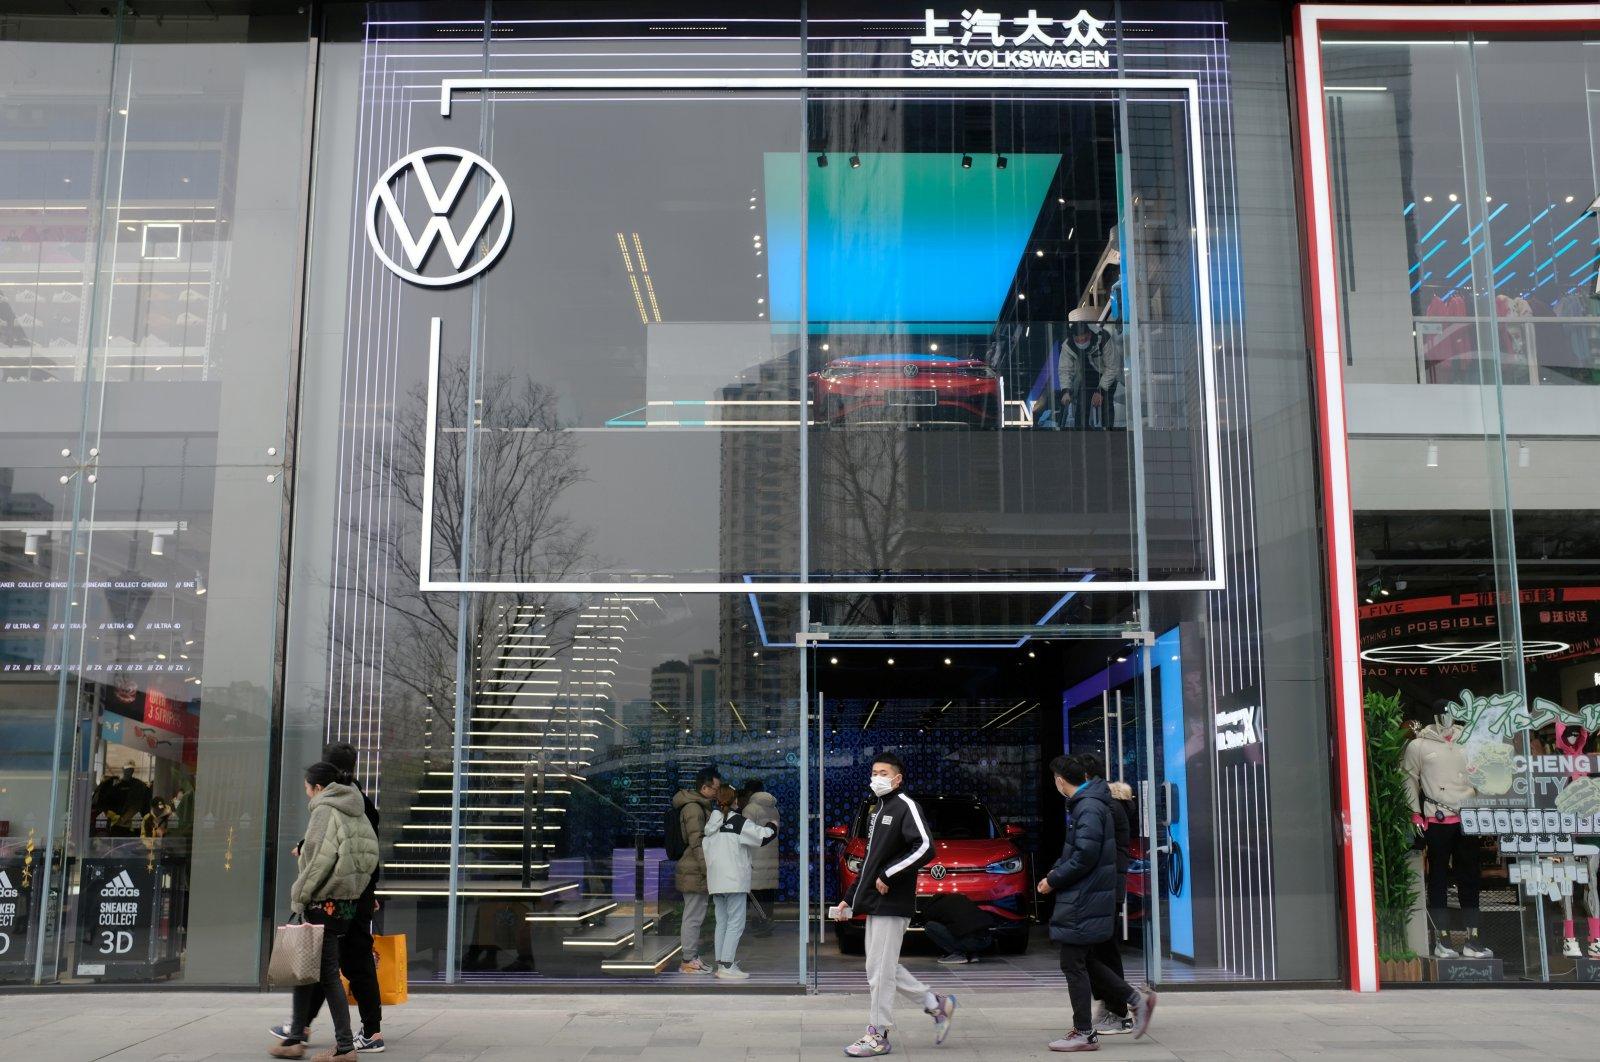 People walk past a showroom of SAIC Volkswagen in Chengdu, Sichuan province, China, Jan. 10, 2021. (Reuters Photo)